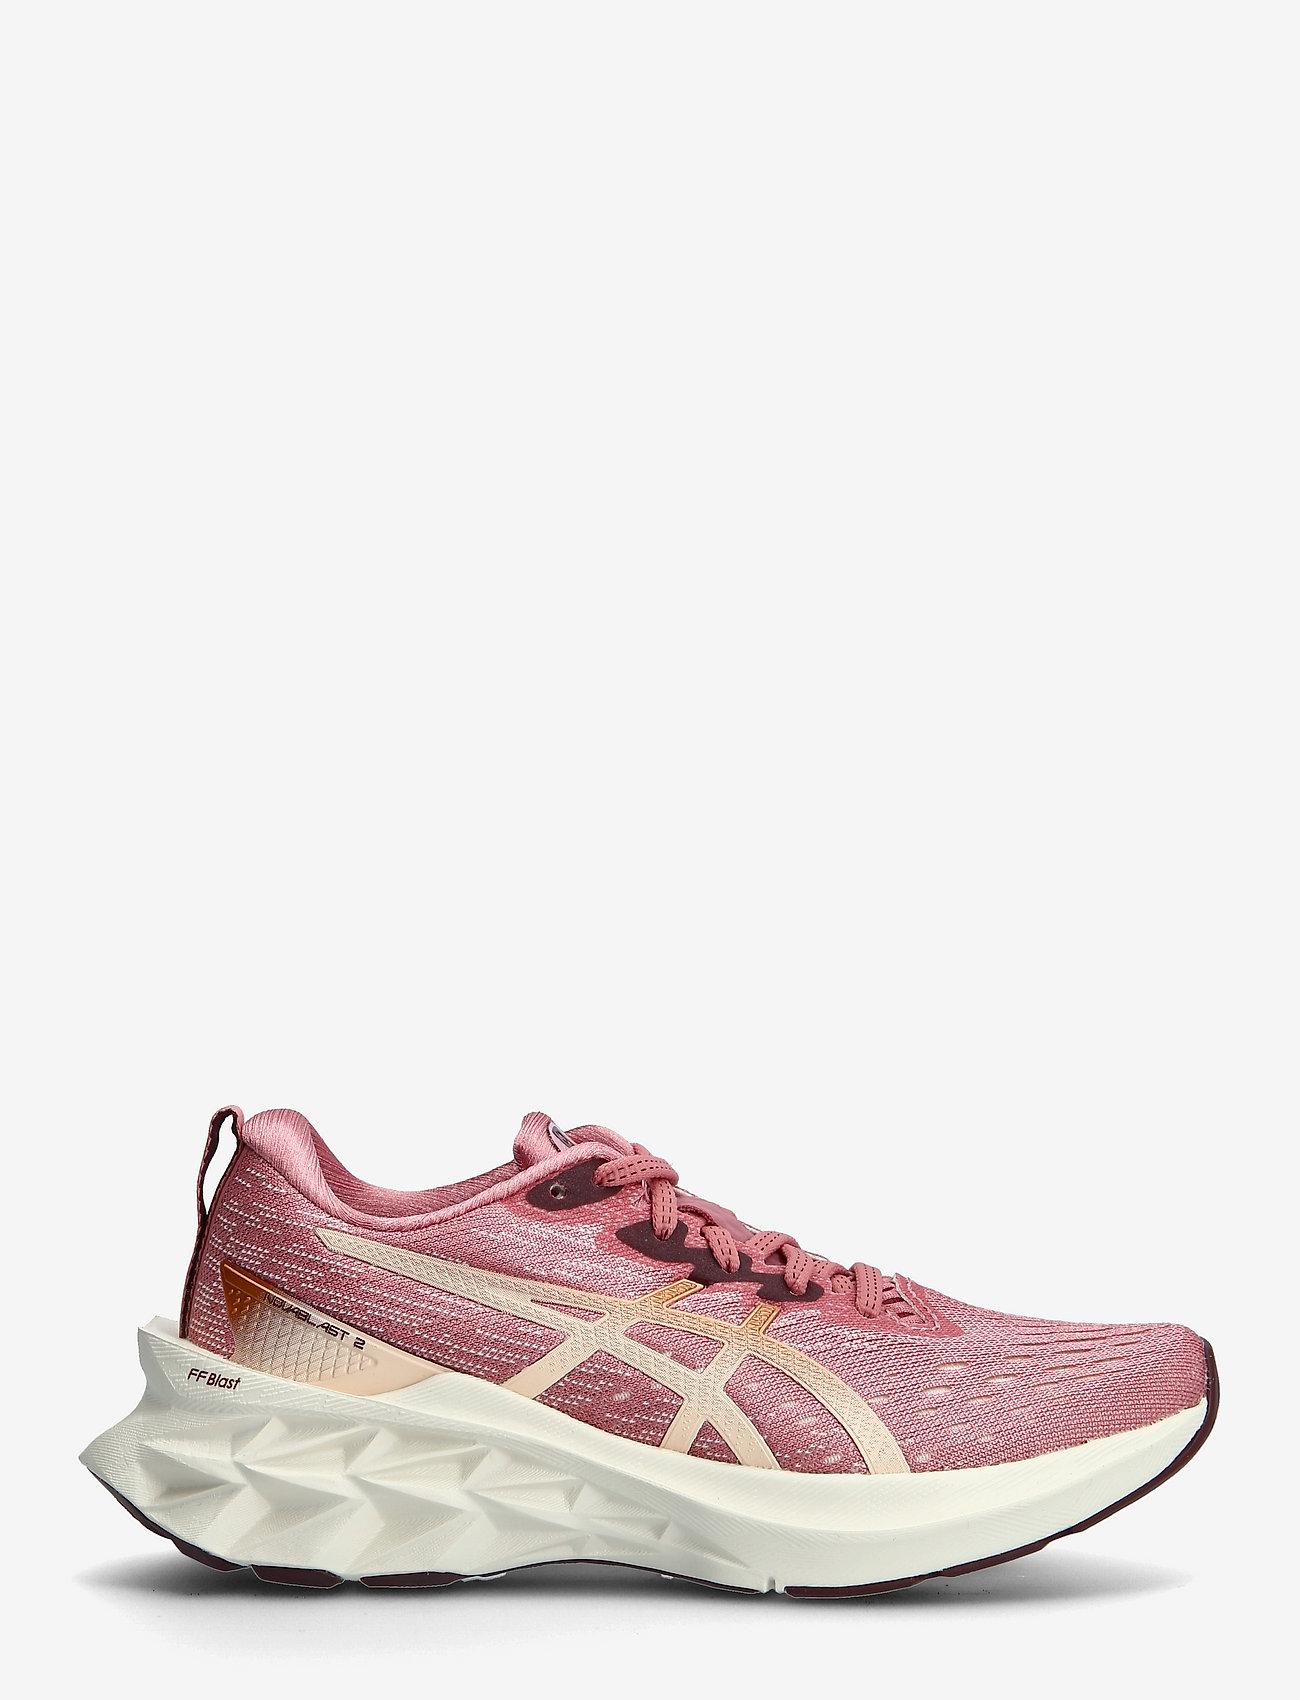 Asics - NOVABLAST 2 - running shoes - smokey rose/pure bronze - 1